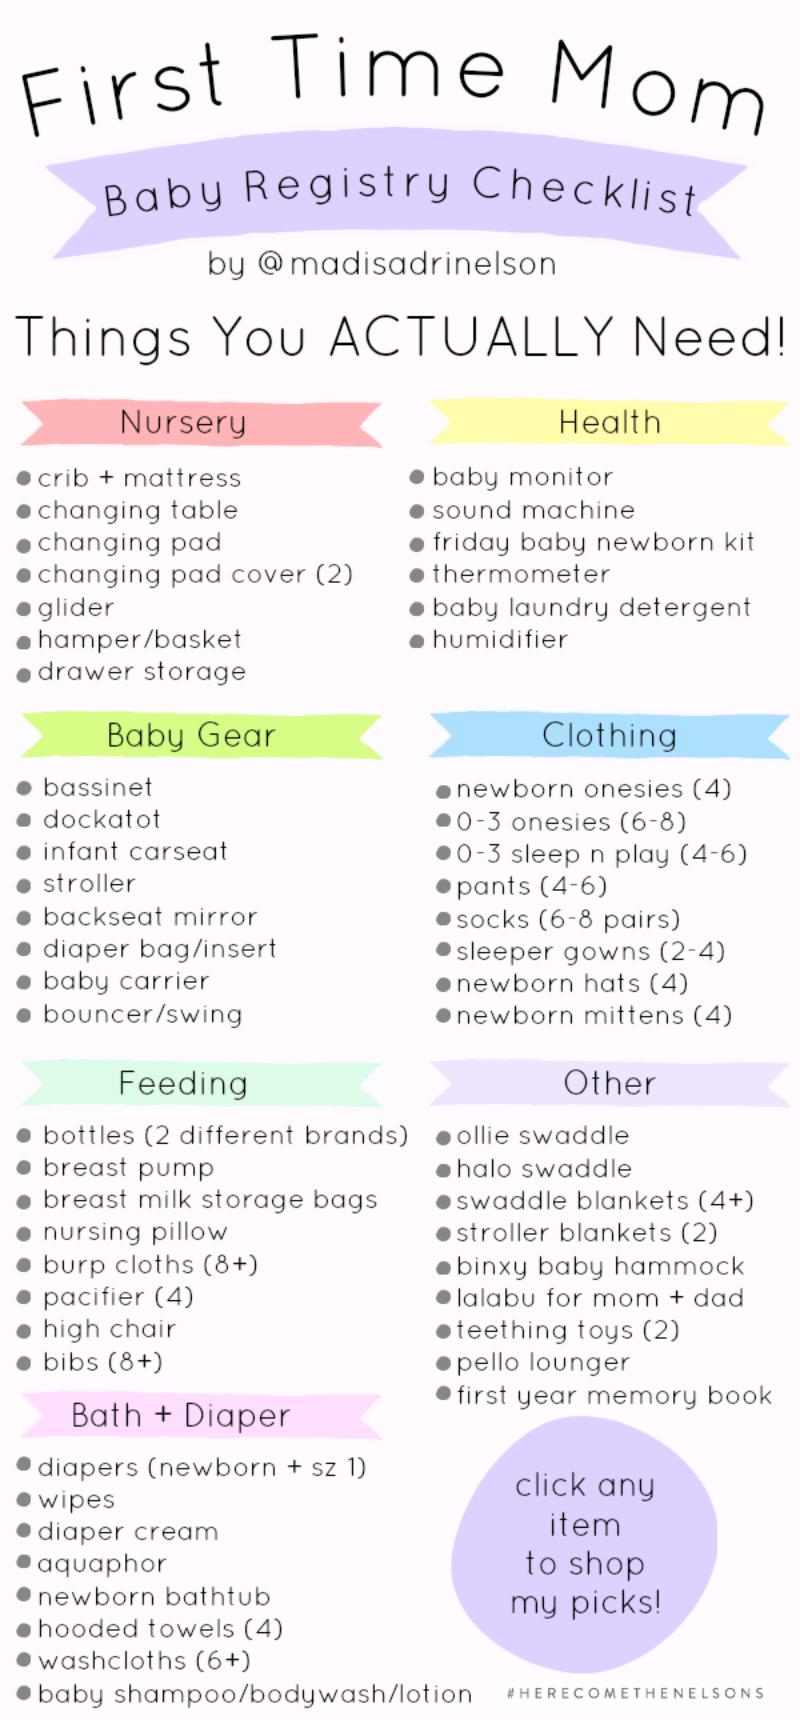 Baby Registry Checklist | First Time Mom Baby Registry Checklist Hey Madi Nelson